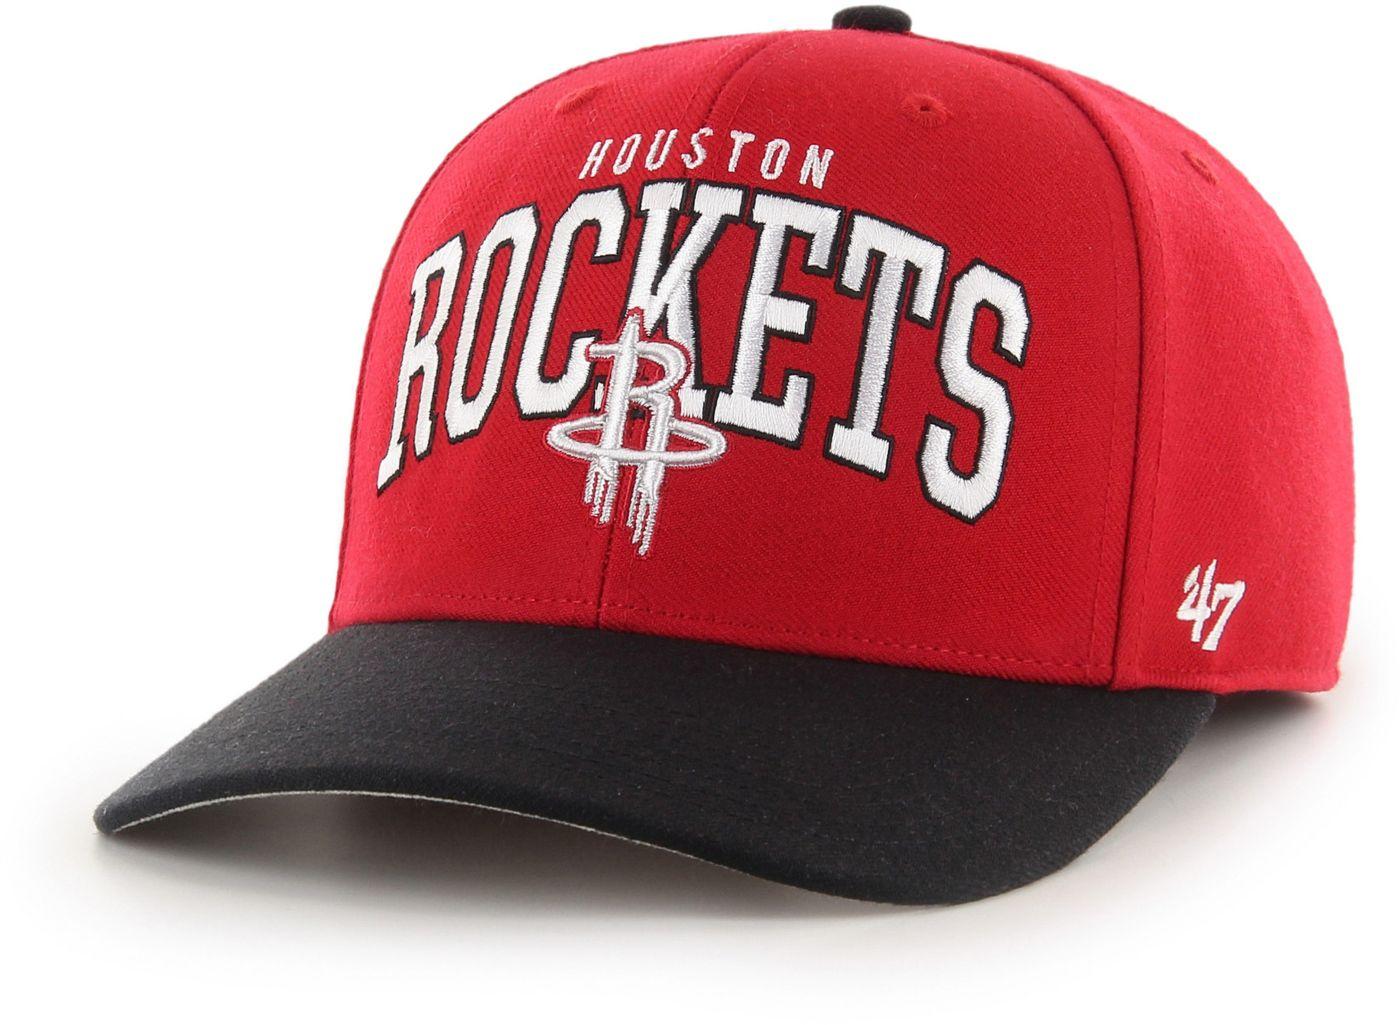 47 Men's Houston Rockets MVP Adjustable Hat